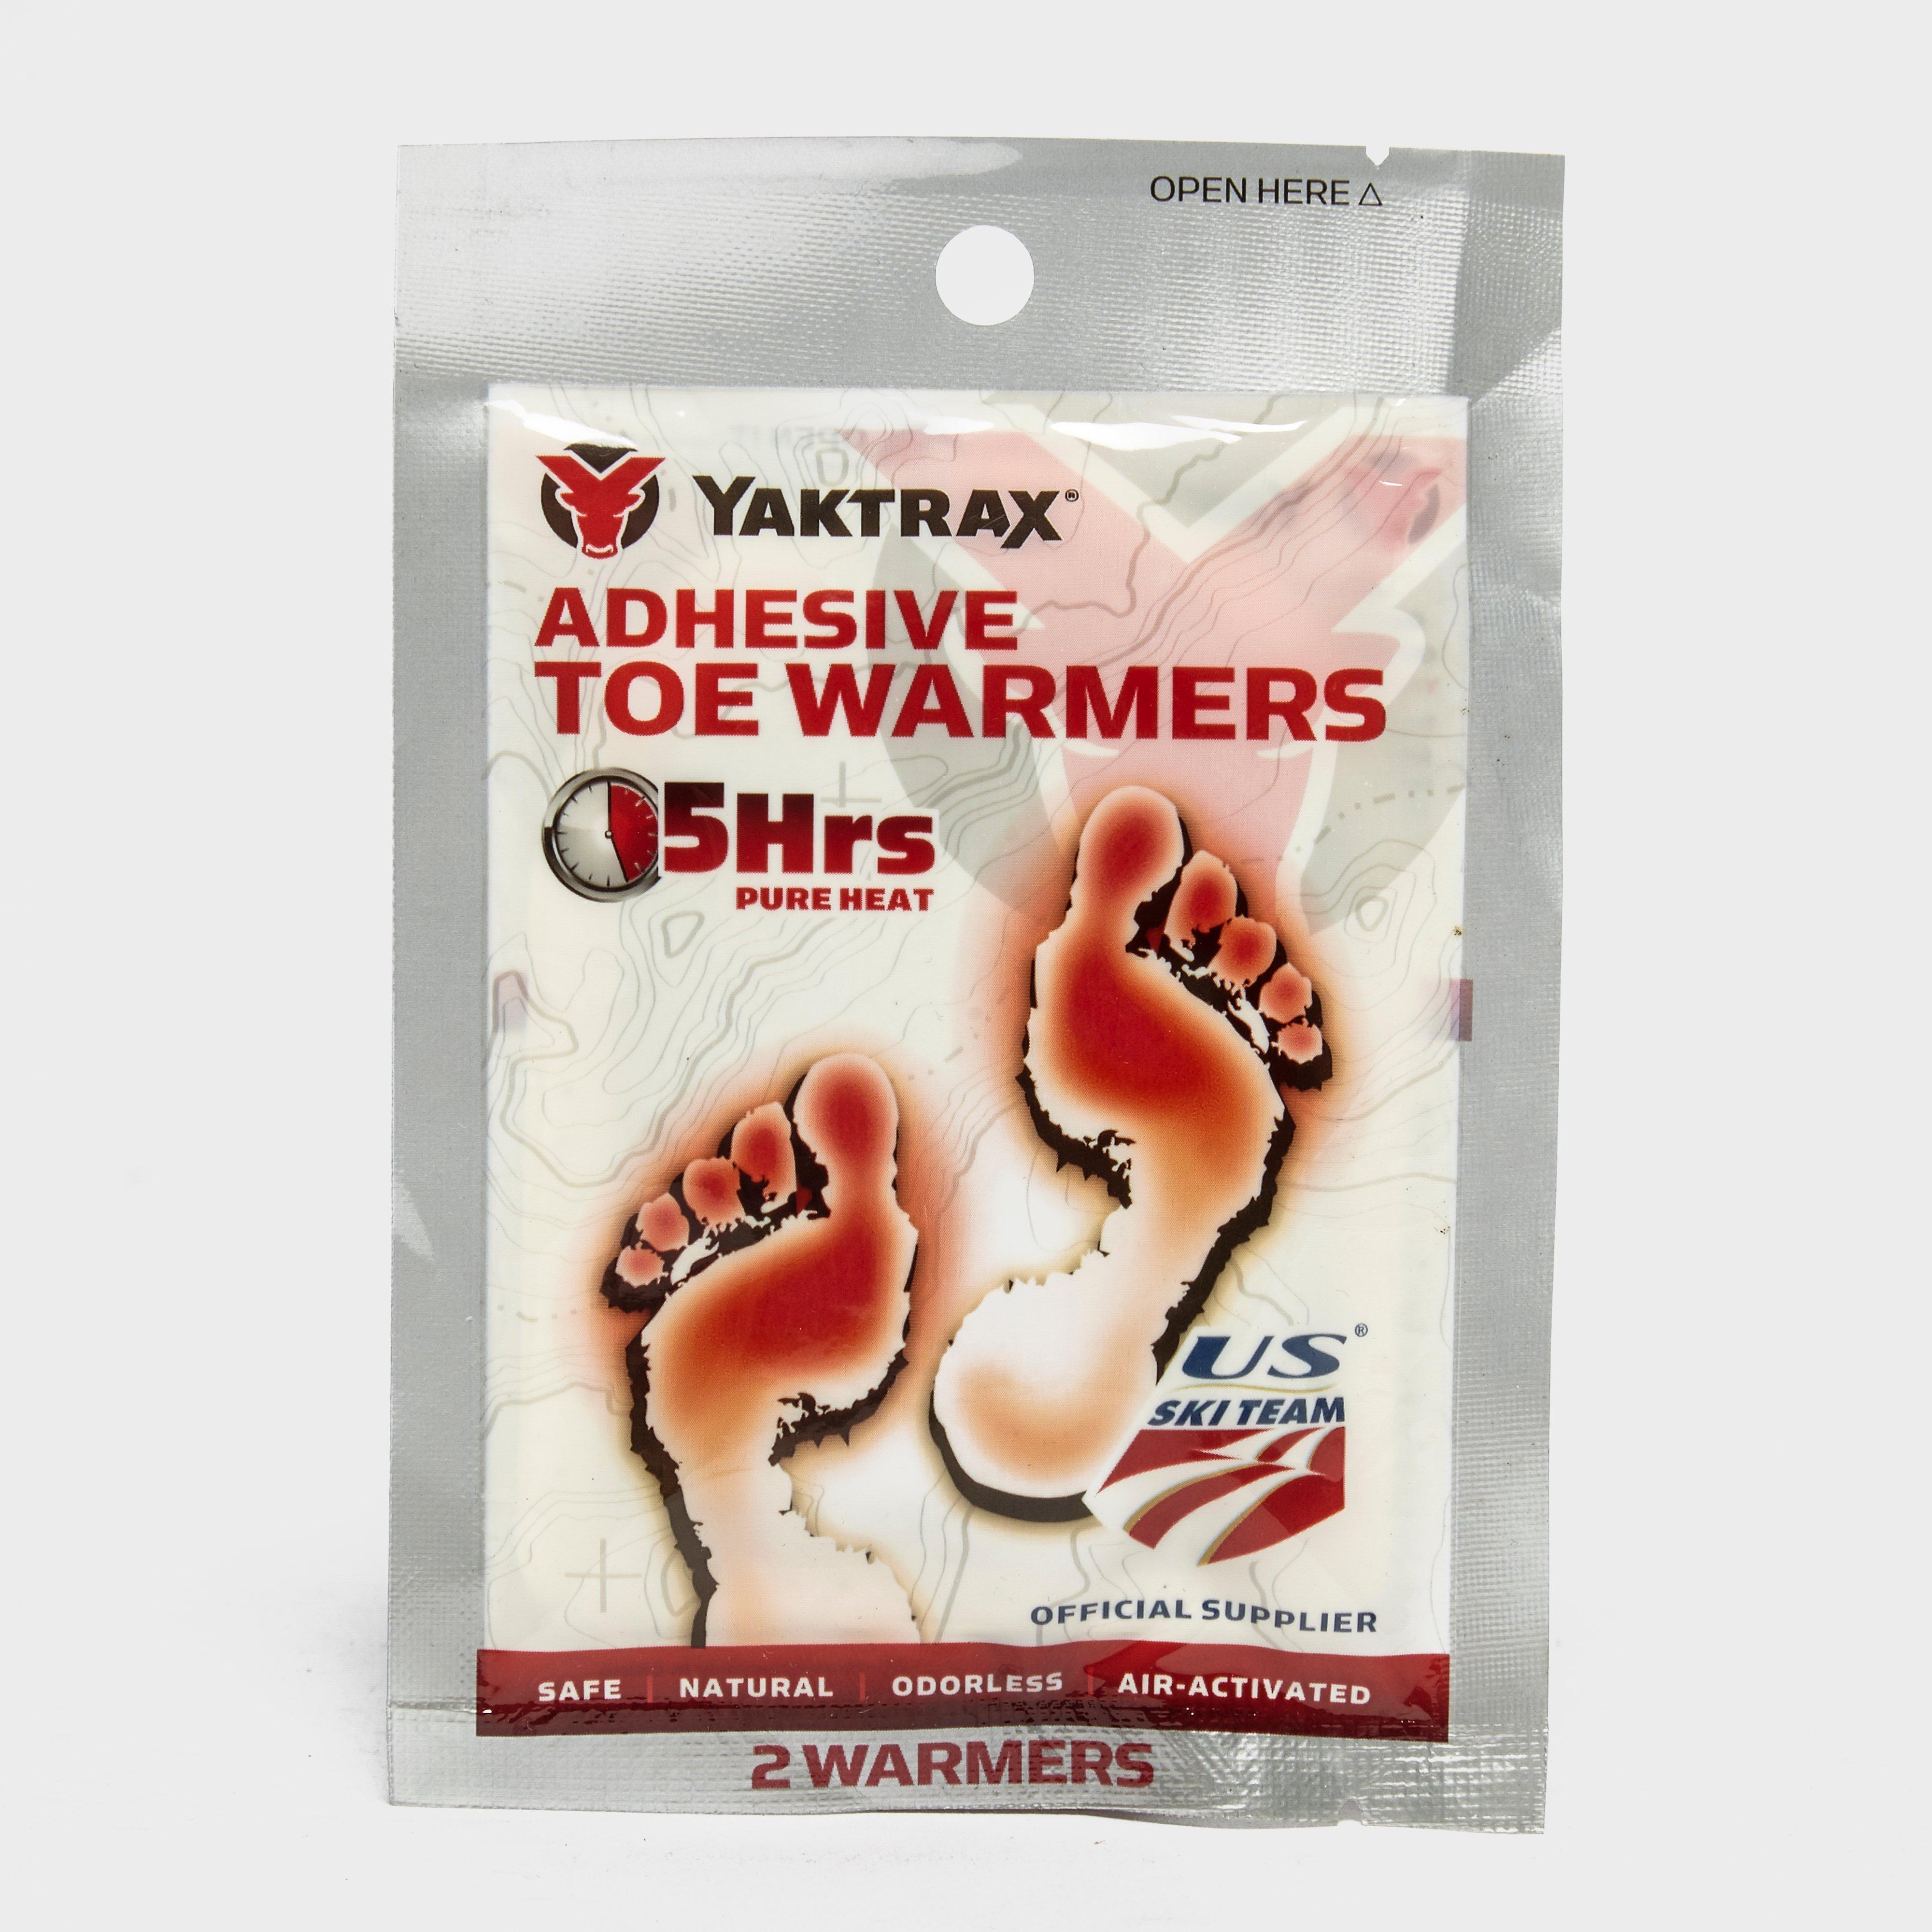 Yaktrax Yaktrax Foot Warmers - N/A, N/A